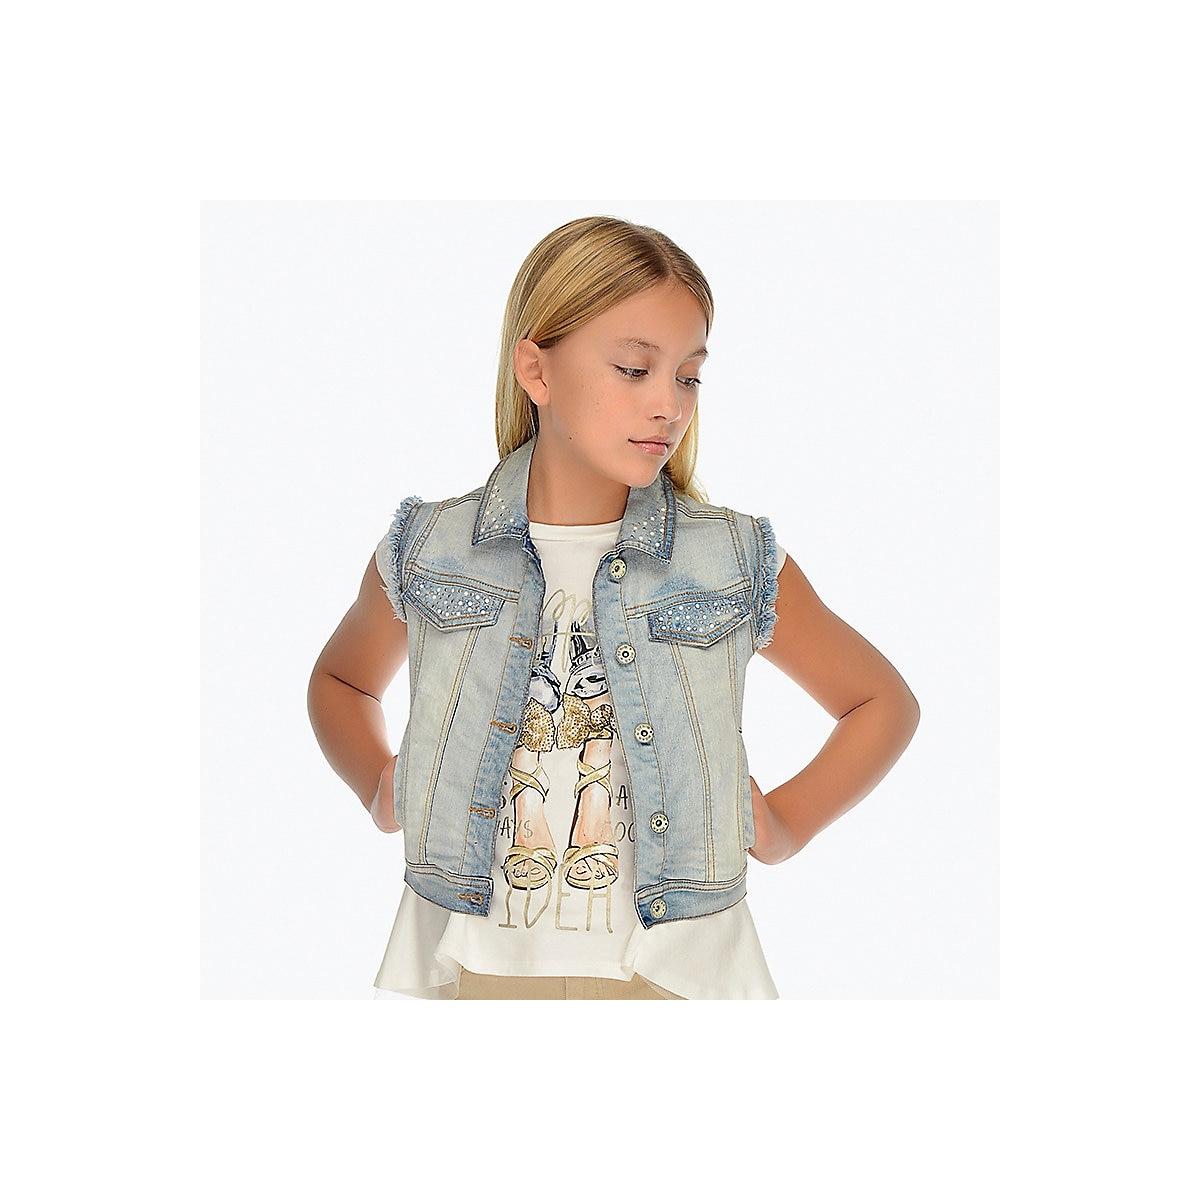 MAYORAL Vests & Waistcoats 10678541 jacket Cotton Blue Girls Casual Denim ribbed hem zip up denim jacket